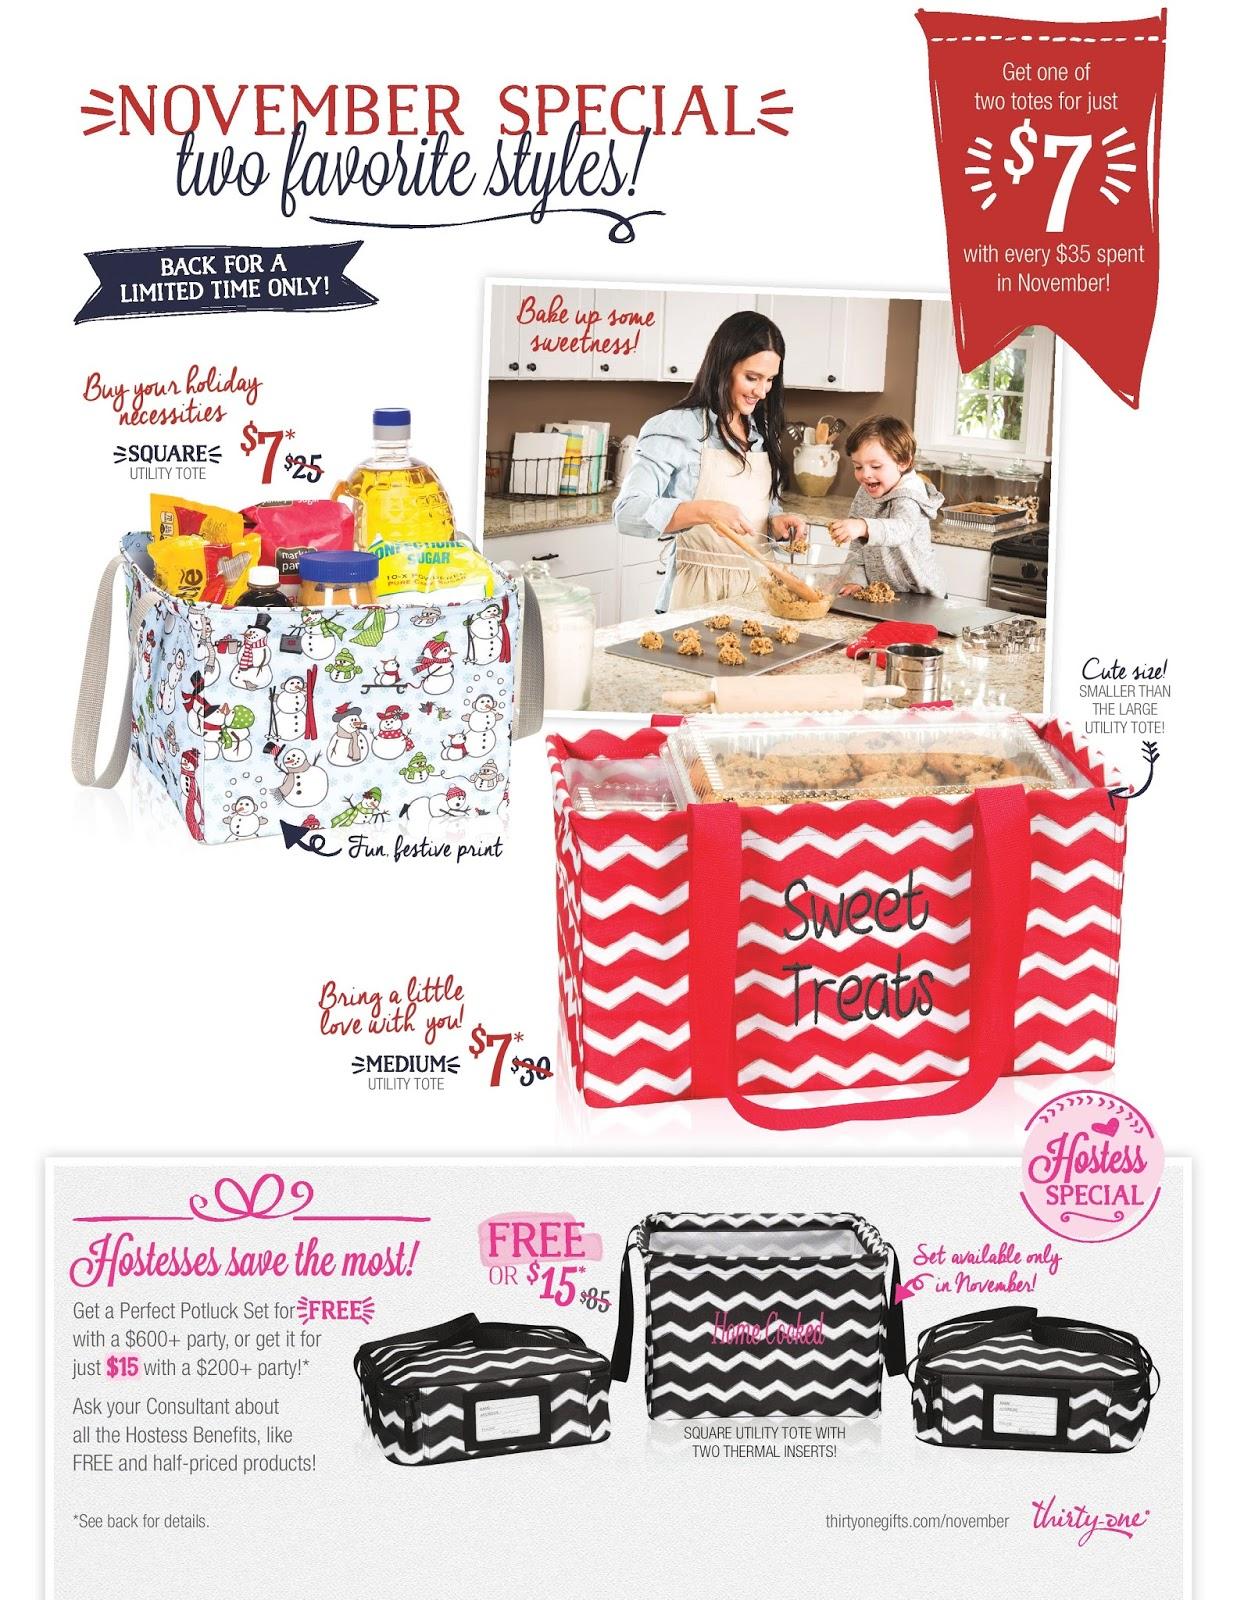 Thirty one november customer special 2014 - Friday November 7 2014